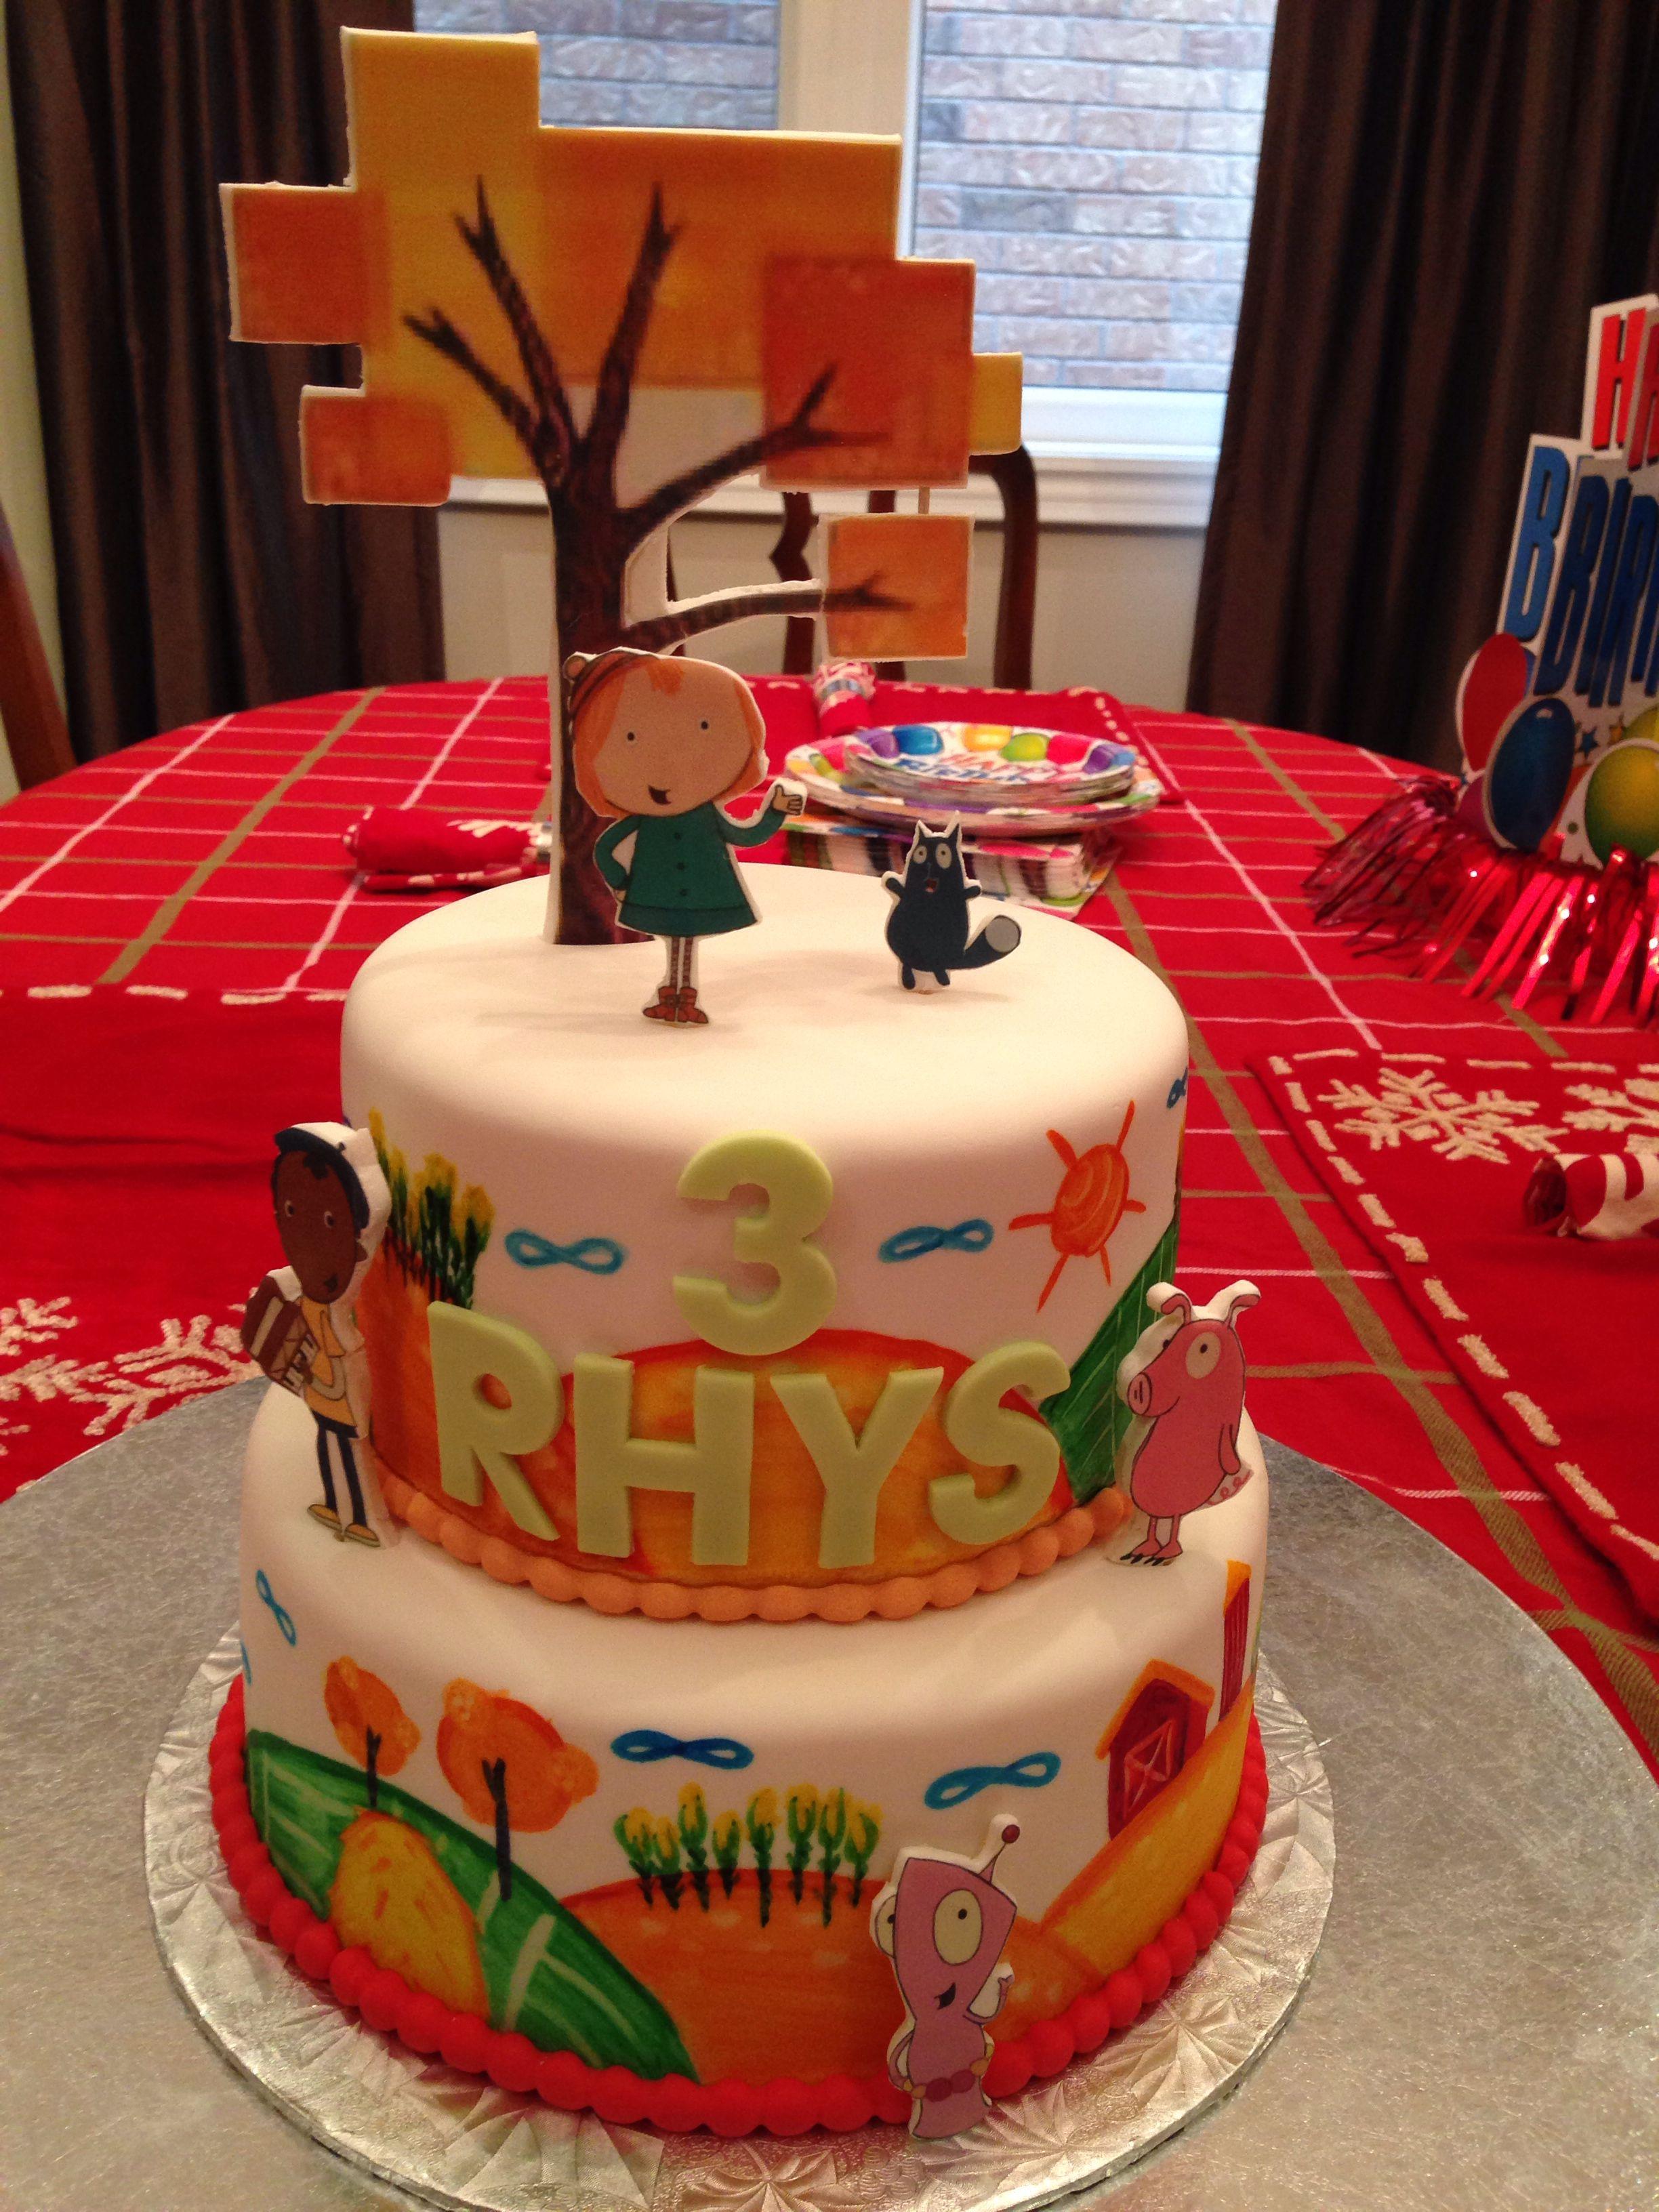 The Best Peg Cat Birthday Cake Thanks To Amanda At La Cupcakes